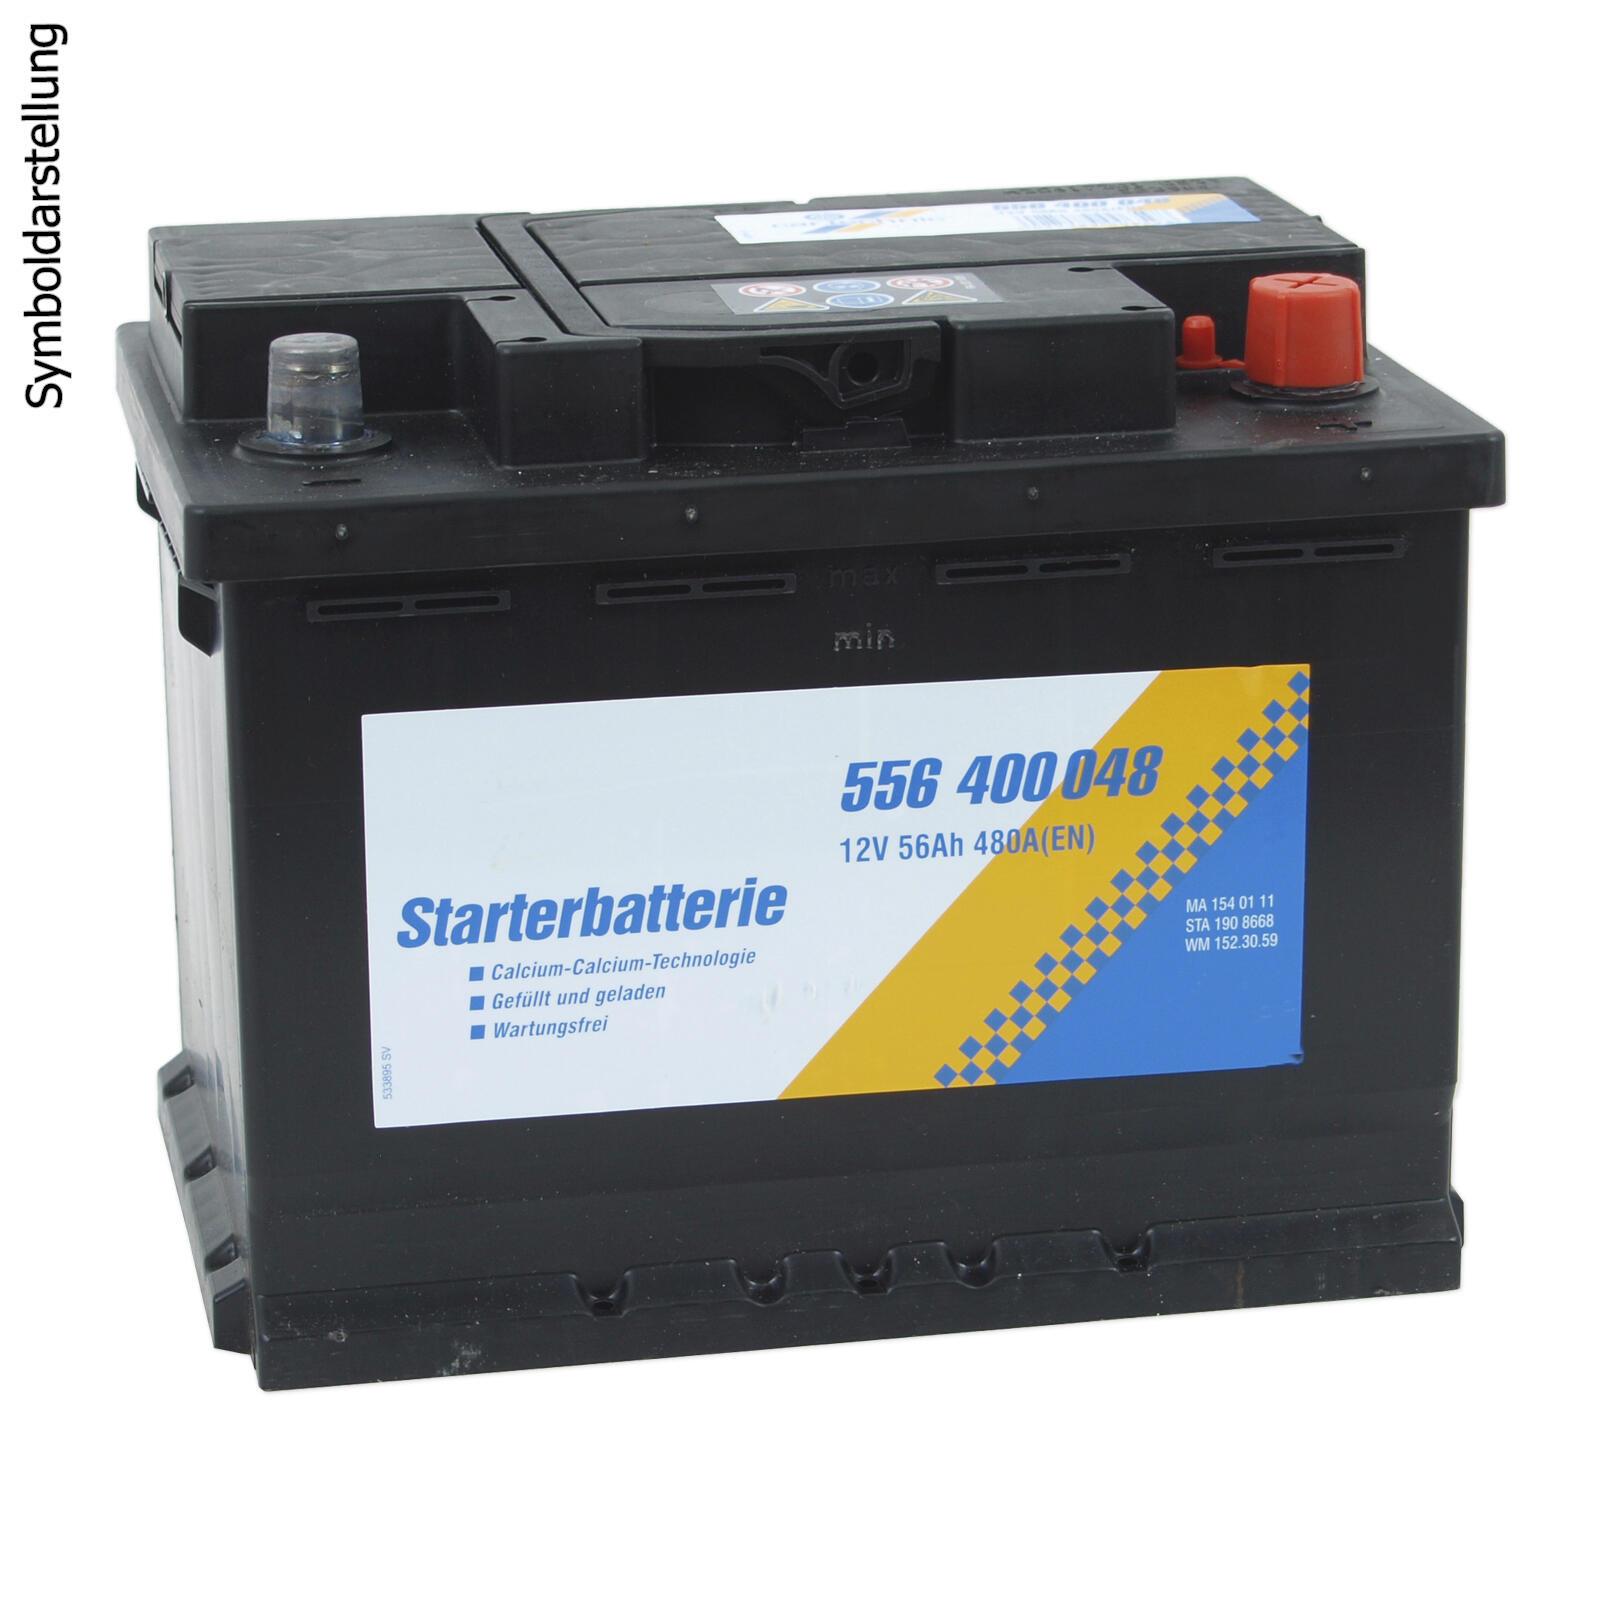 Starterbatterie